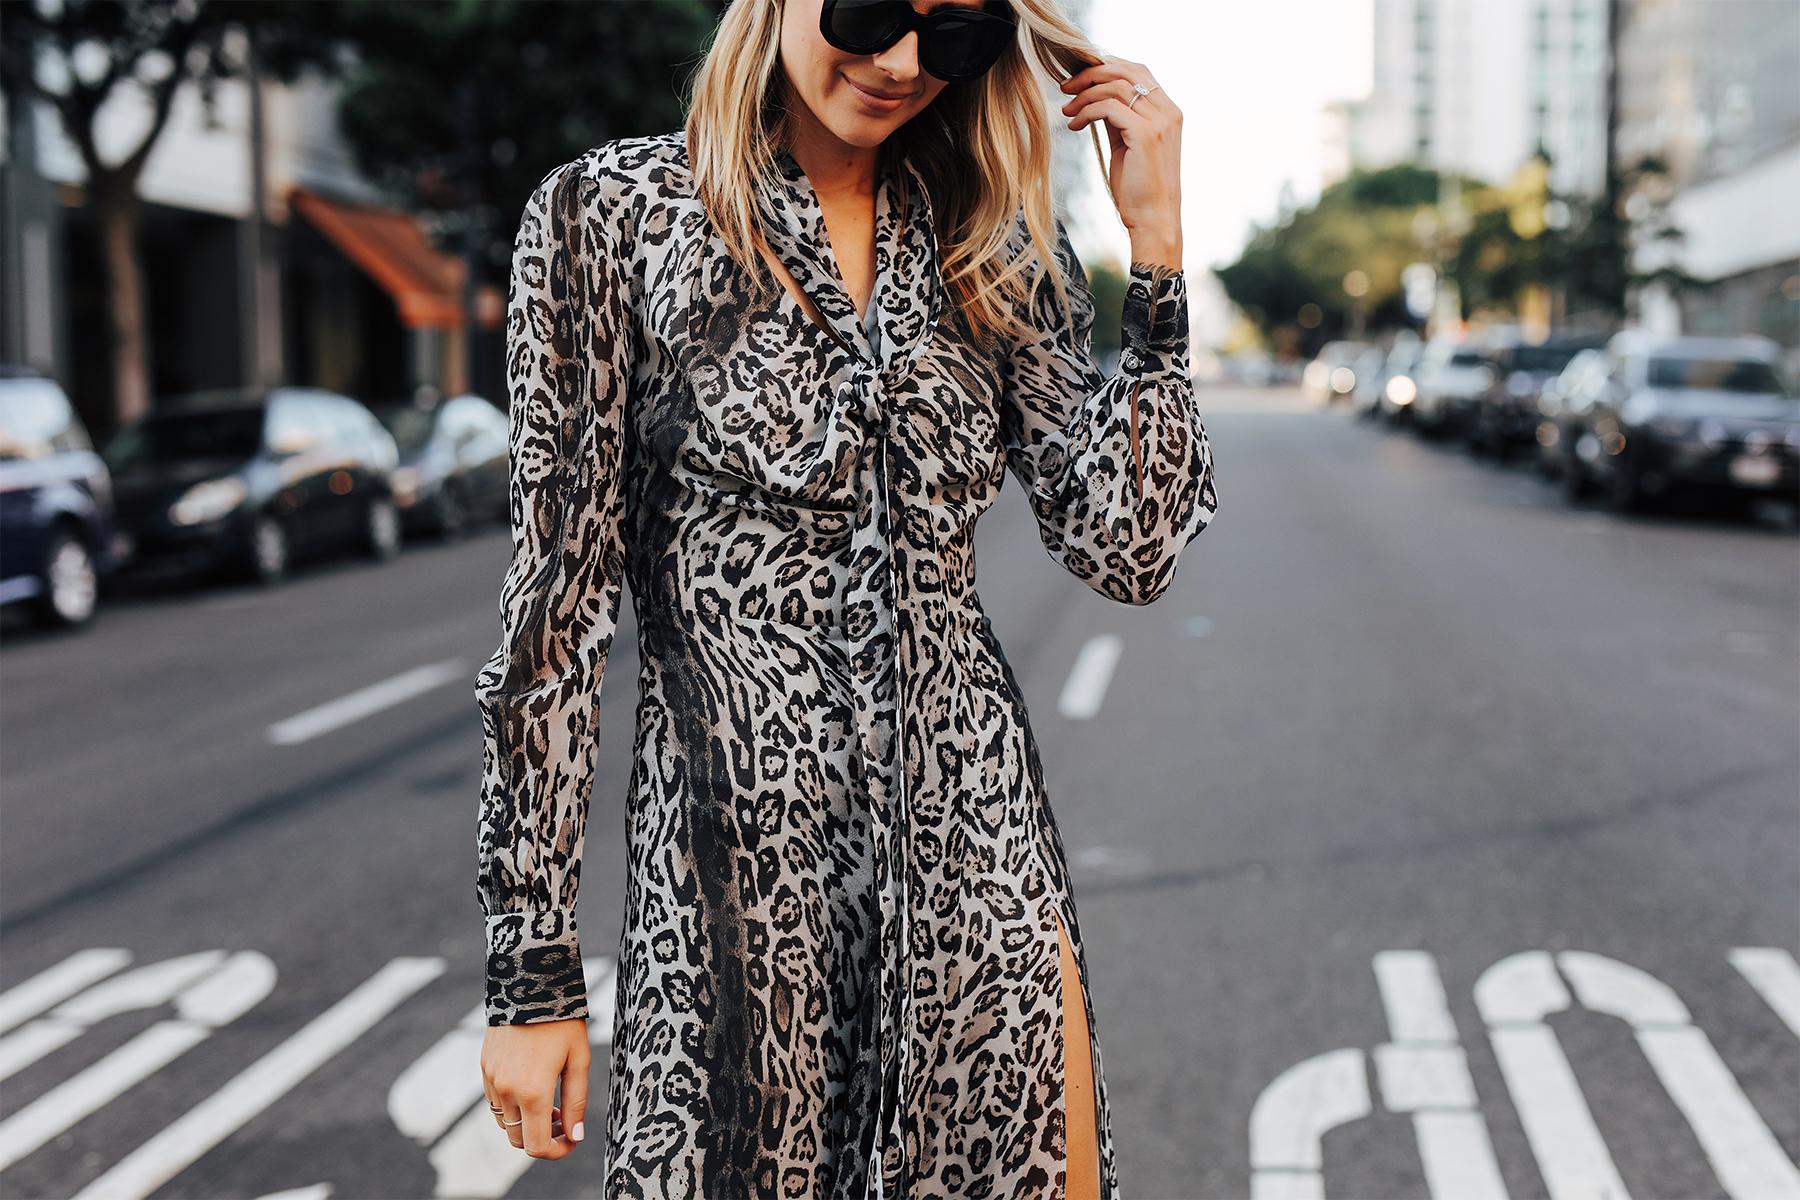 Fashion Jackson Wearing tommy hilfiger zendaya collection snow leopard dress